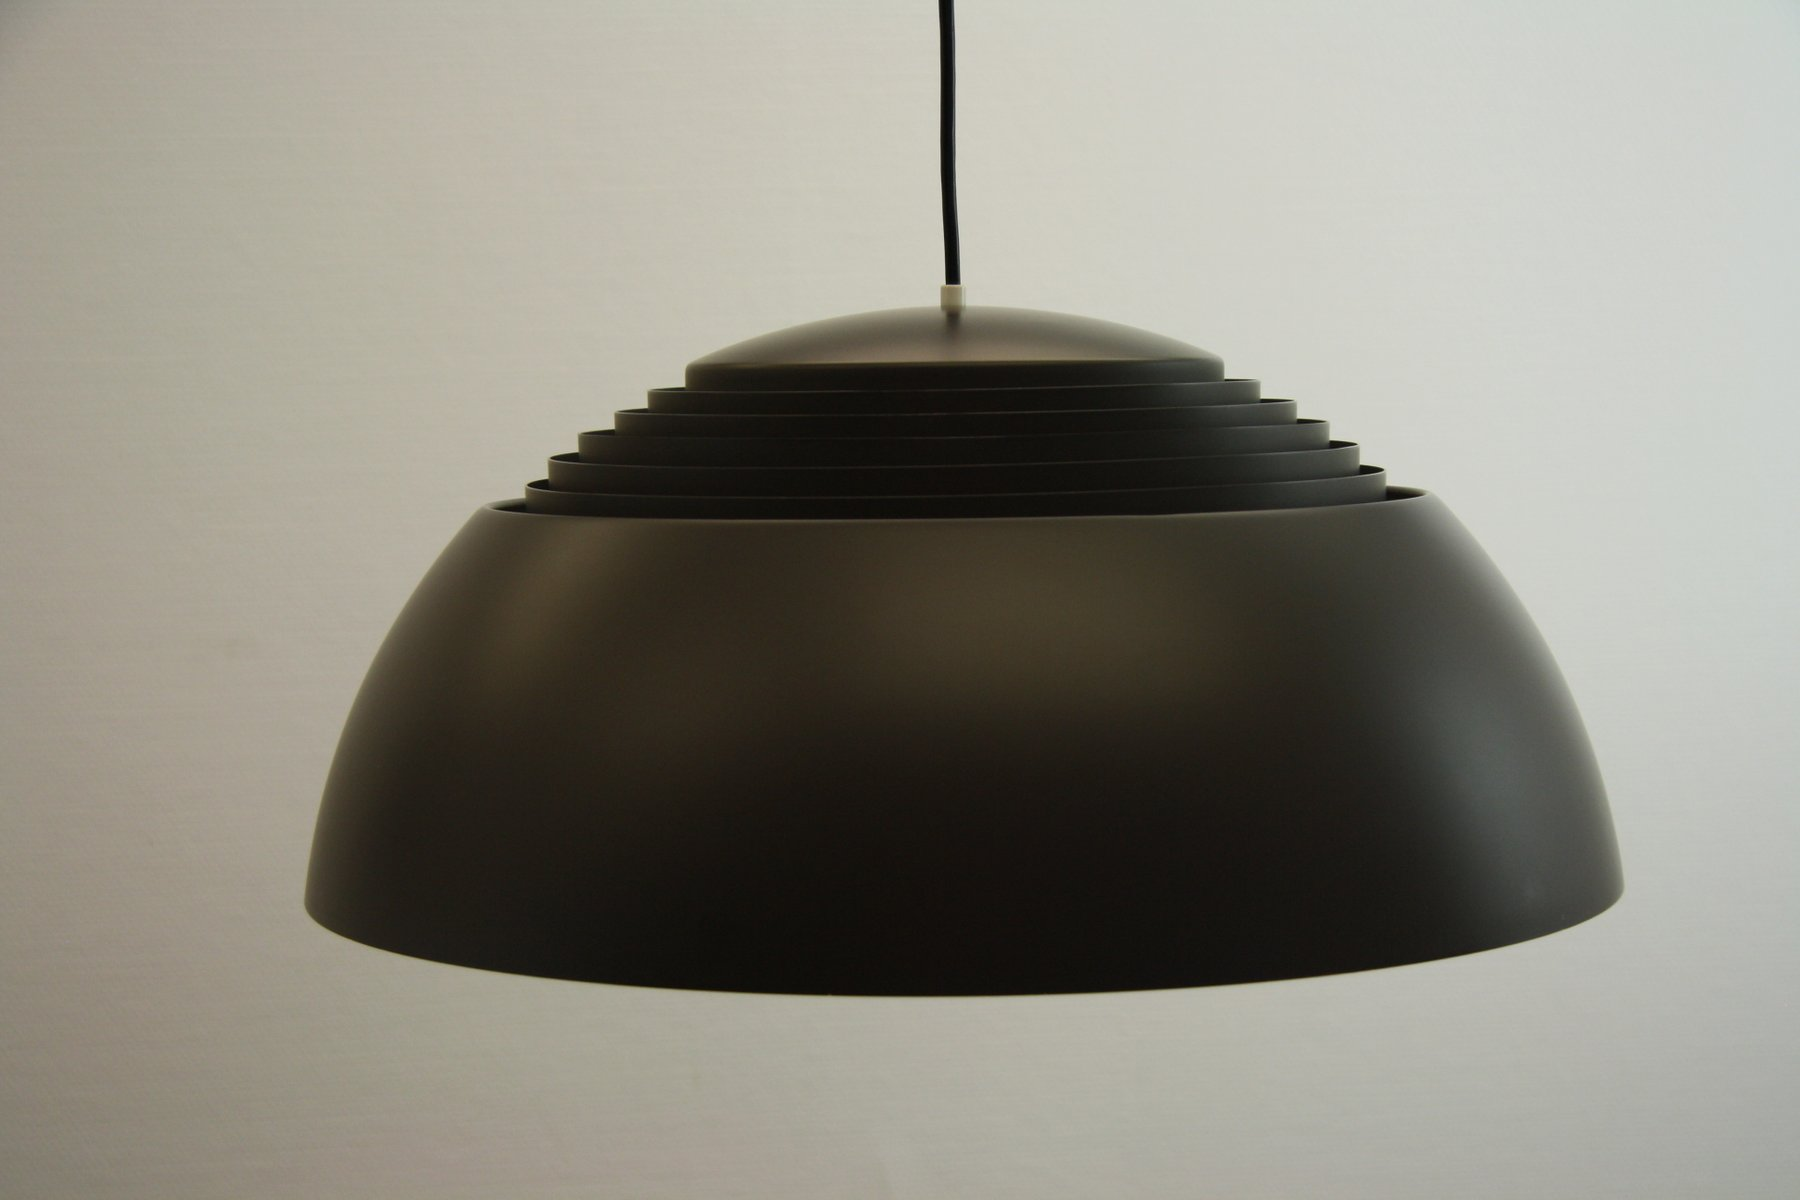 Arne Jacobsen Lampe Vintage